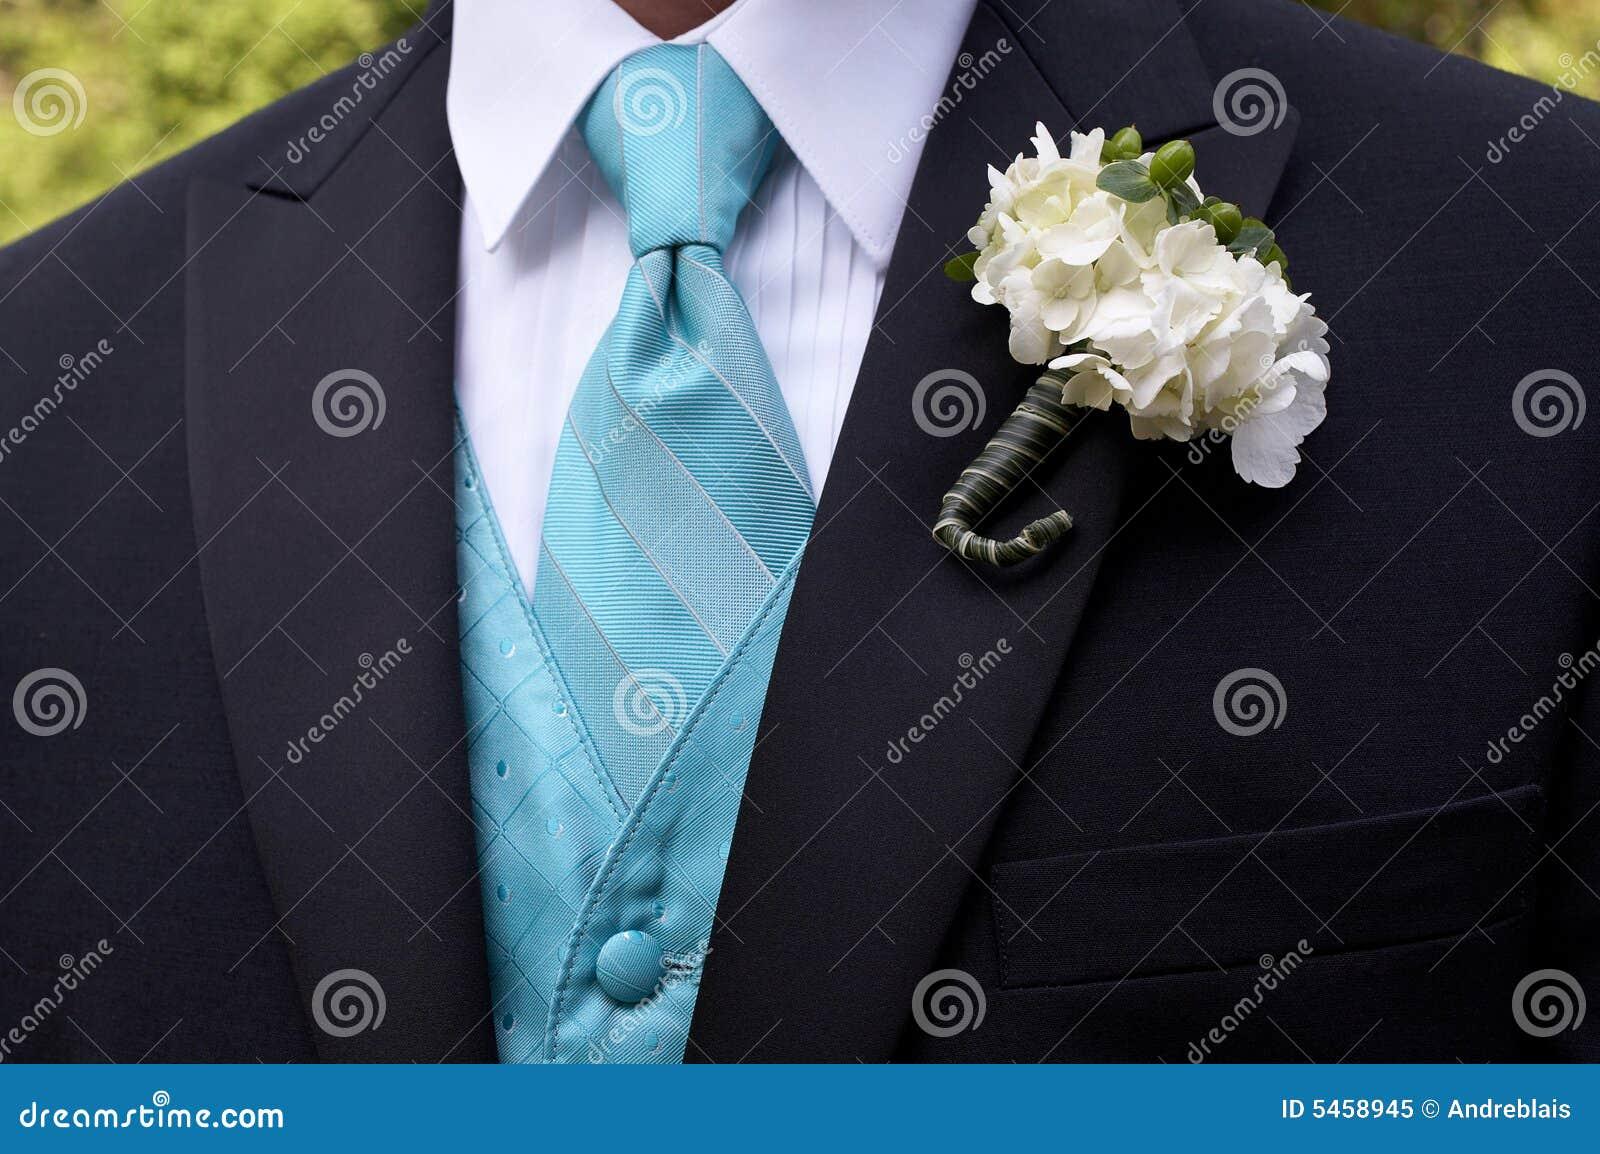 boutonniere de mariage image stock image du chemise type. Black Bedroom Furniture Sets. Home Design Ideas